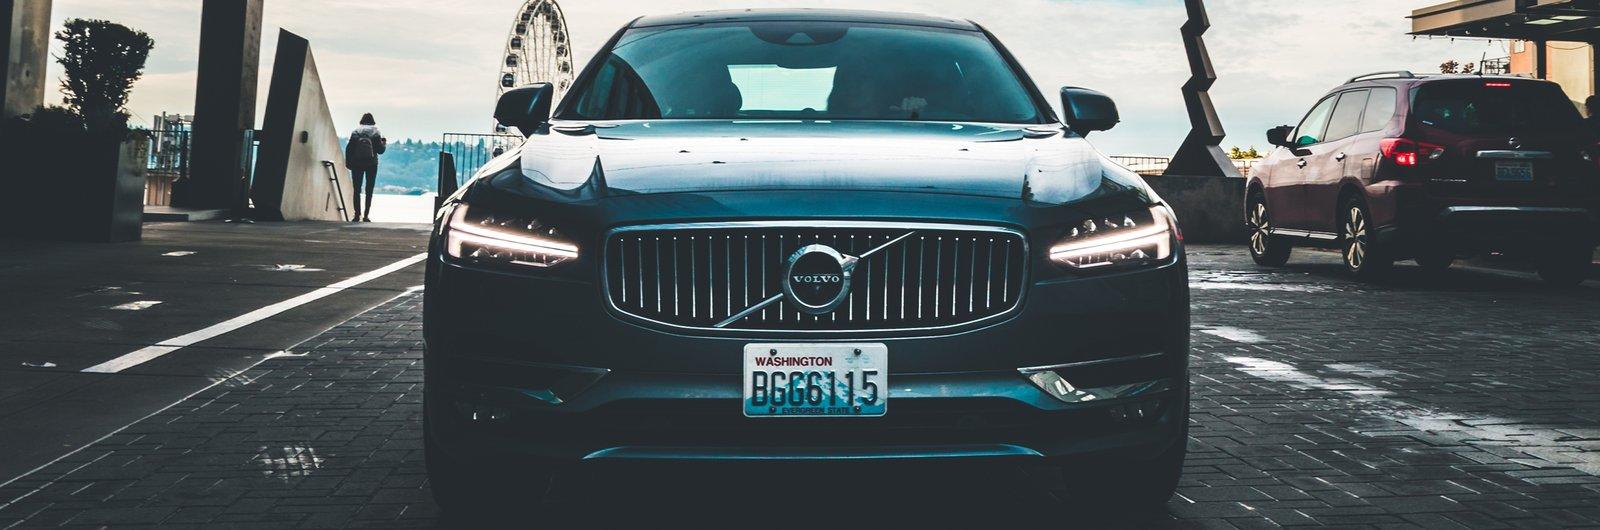 Car Rental Seattle Huge Savings Sixt Rent A Car